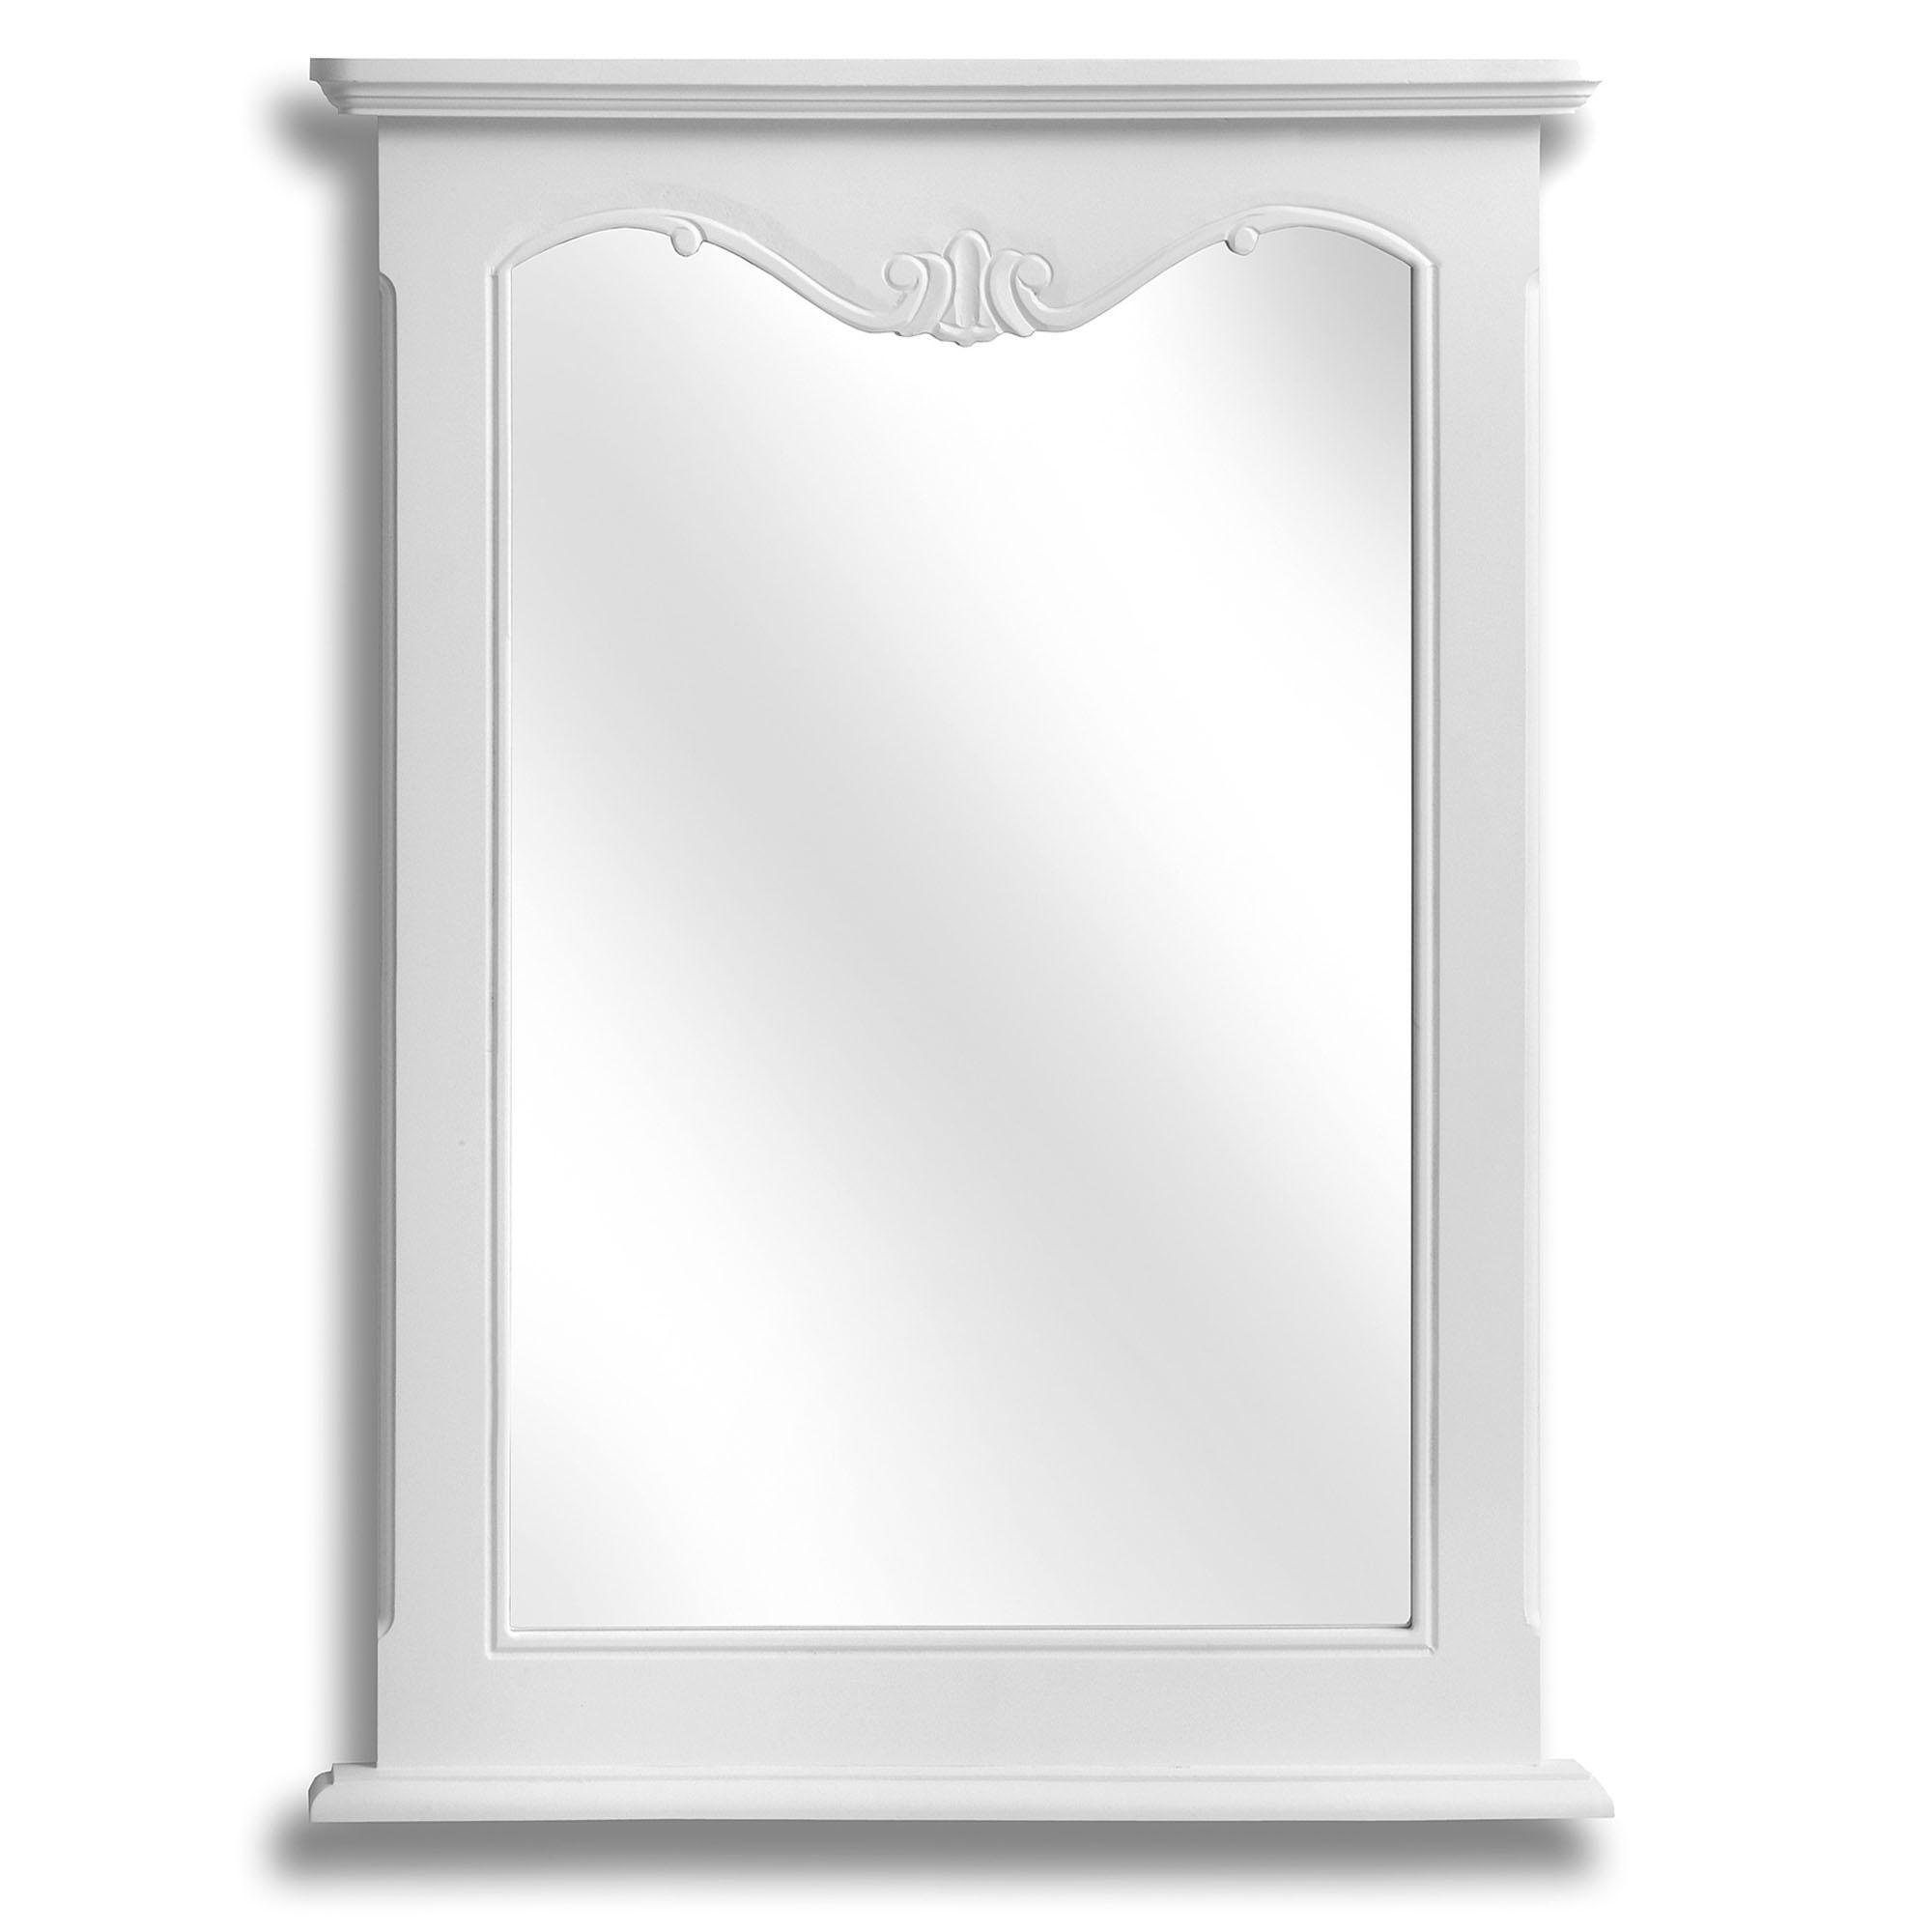 Fleur White Shabby Chic Wall Mirror Inside Newest White Shabby Chic Wall Mirrors (Gallery 9 of 20)